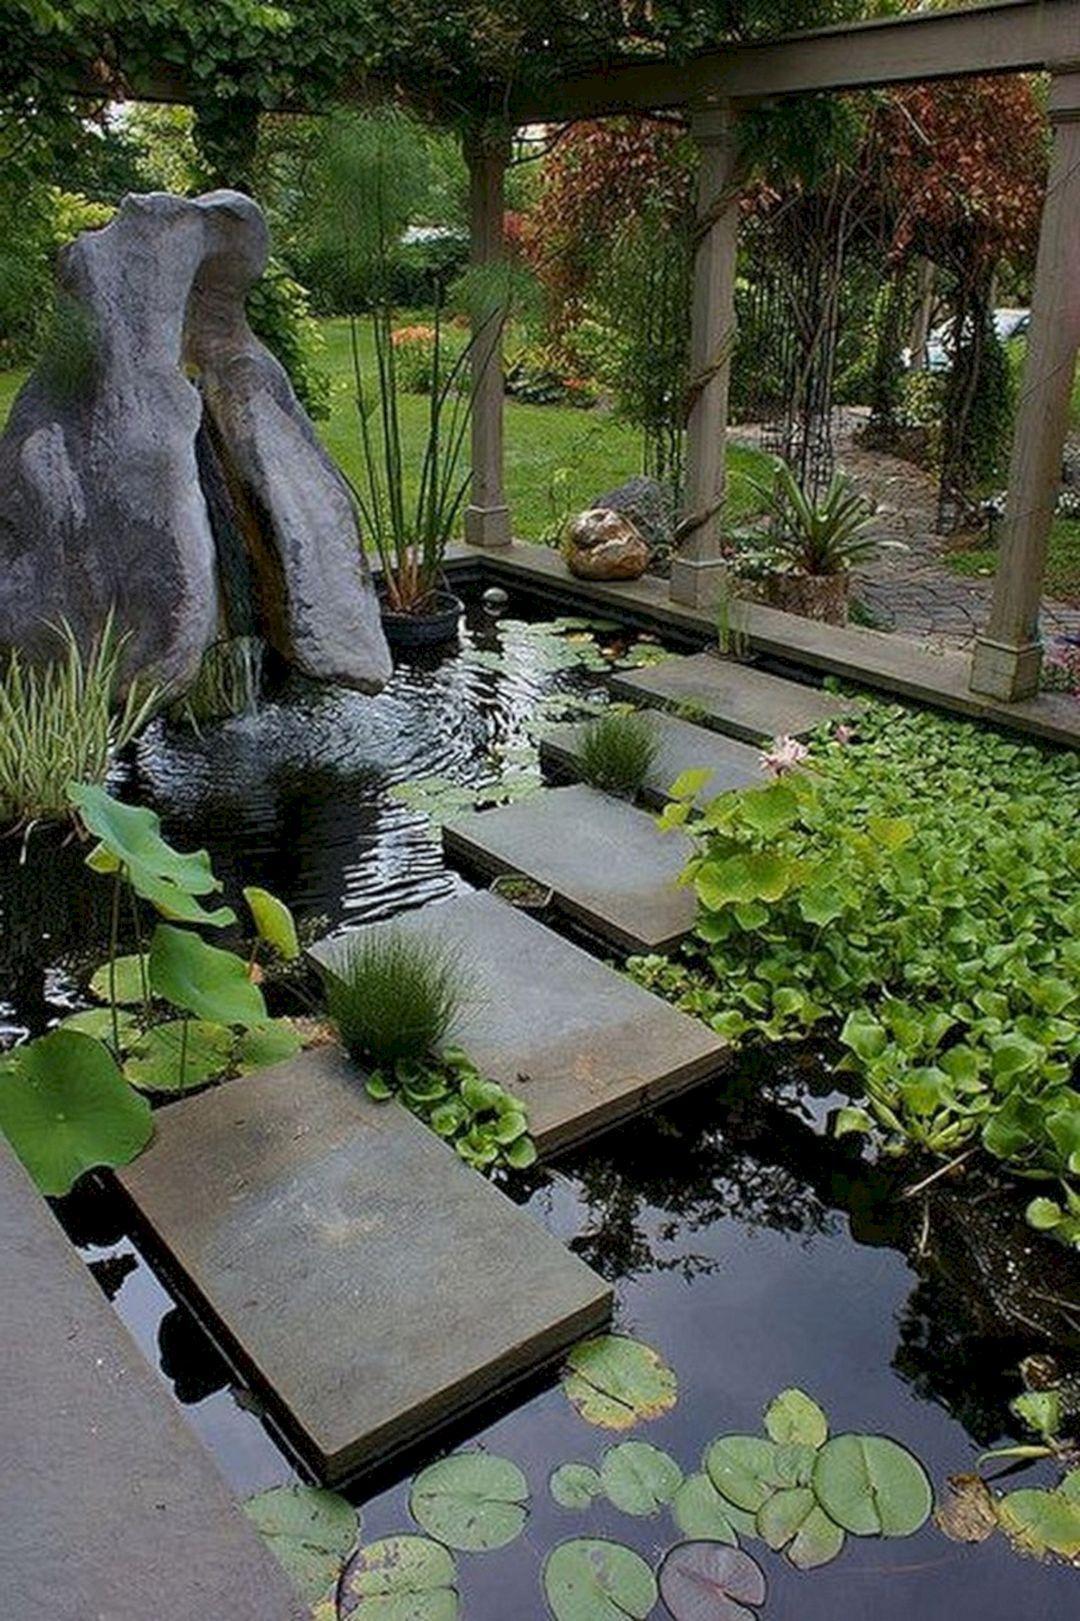 30 Awesome Home Garden Landscaping Ideas With Fish Pond Design Decor It S Japanese Garden Landscape Landscape Design Ponds Backyard